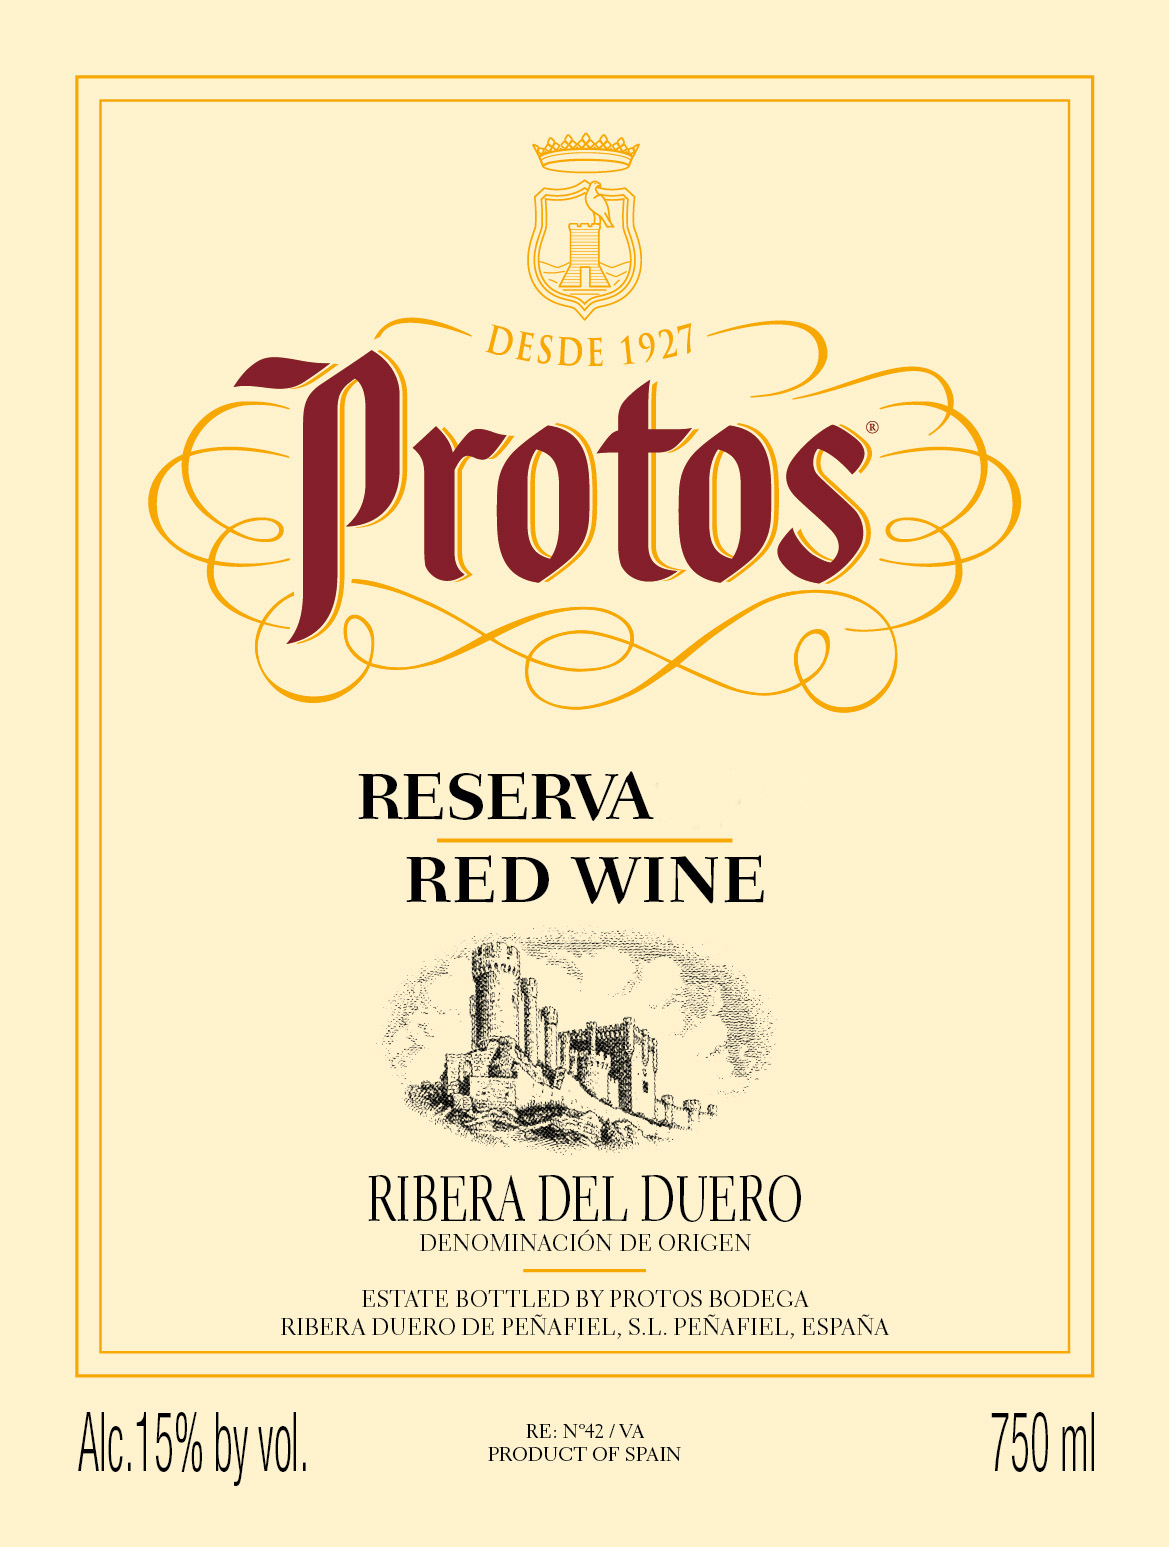 Protos - Reserva label